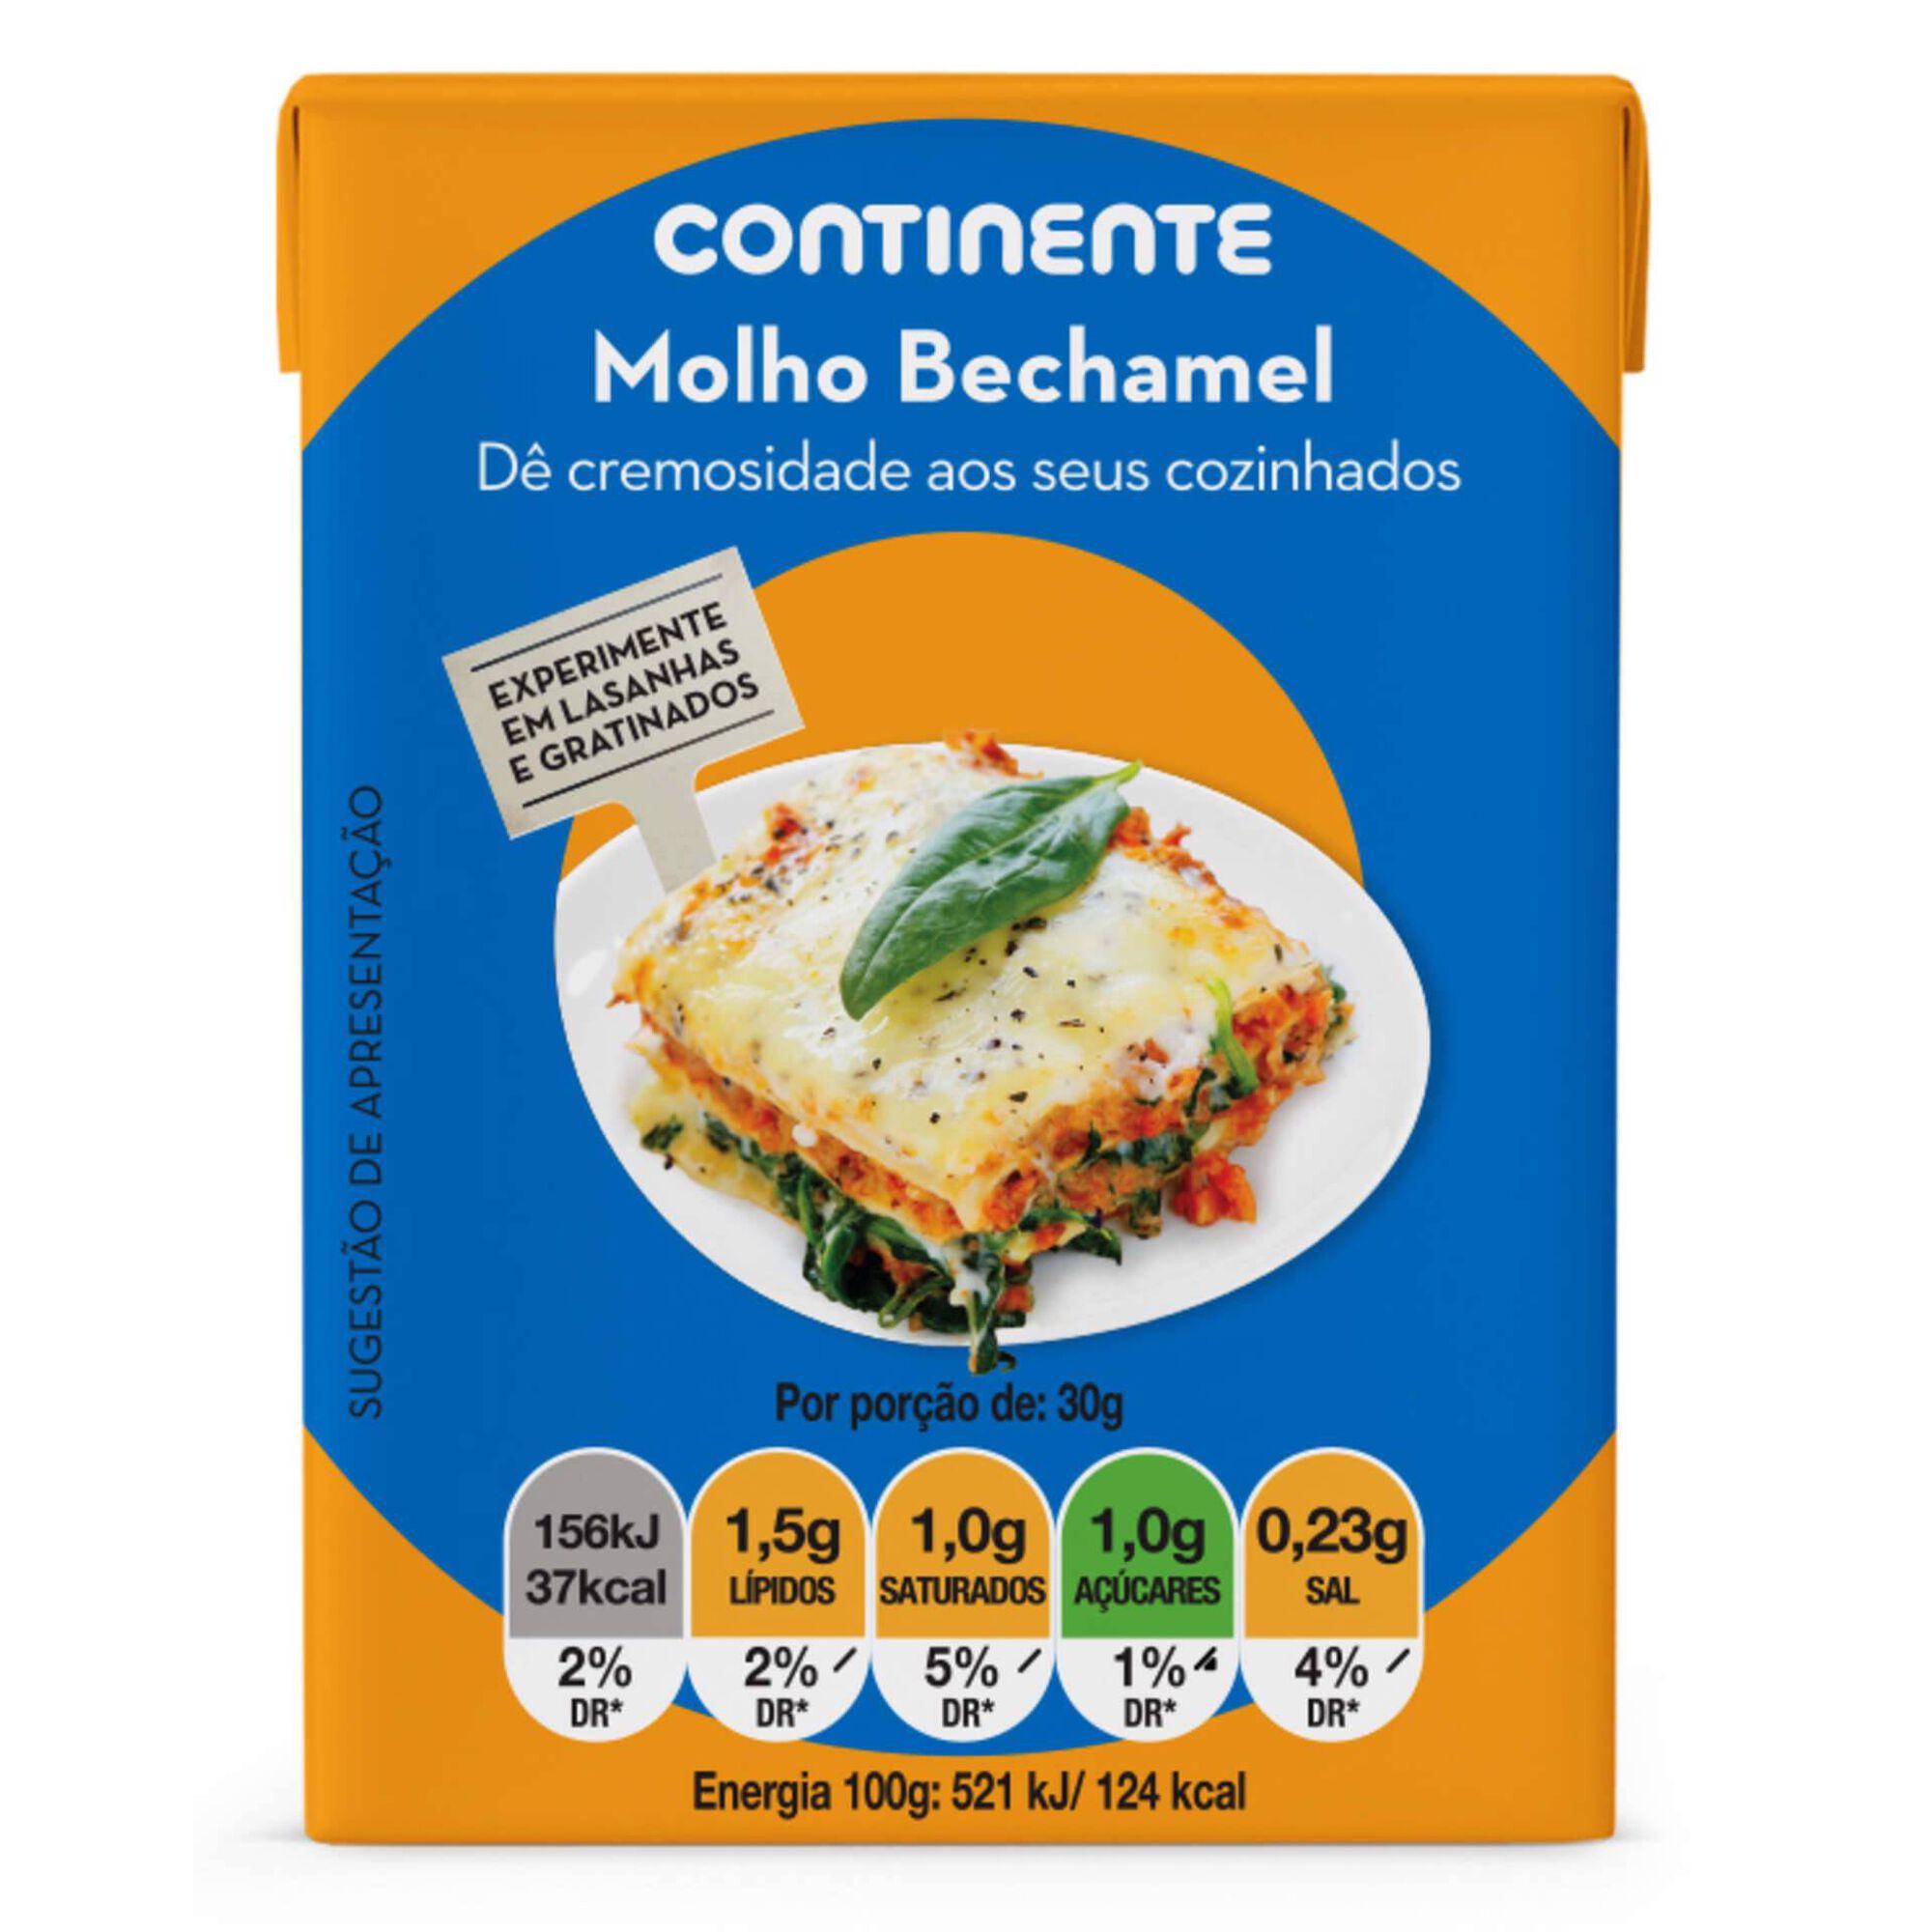 Molho Bechamel